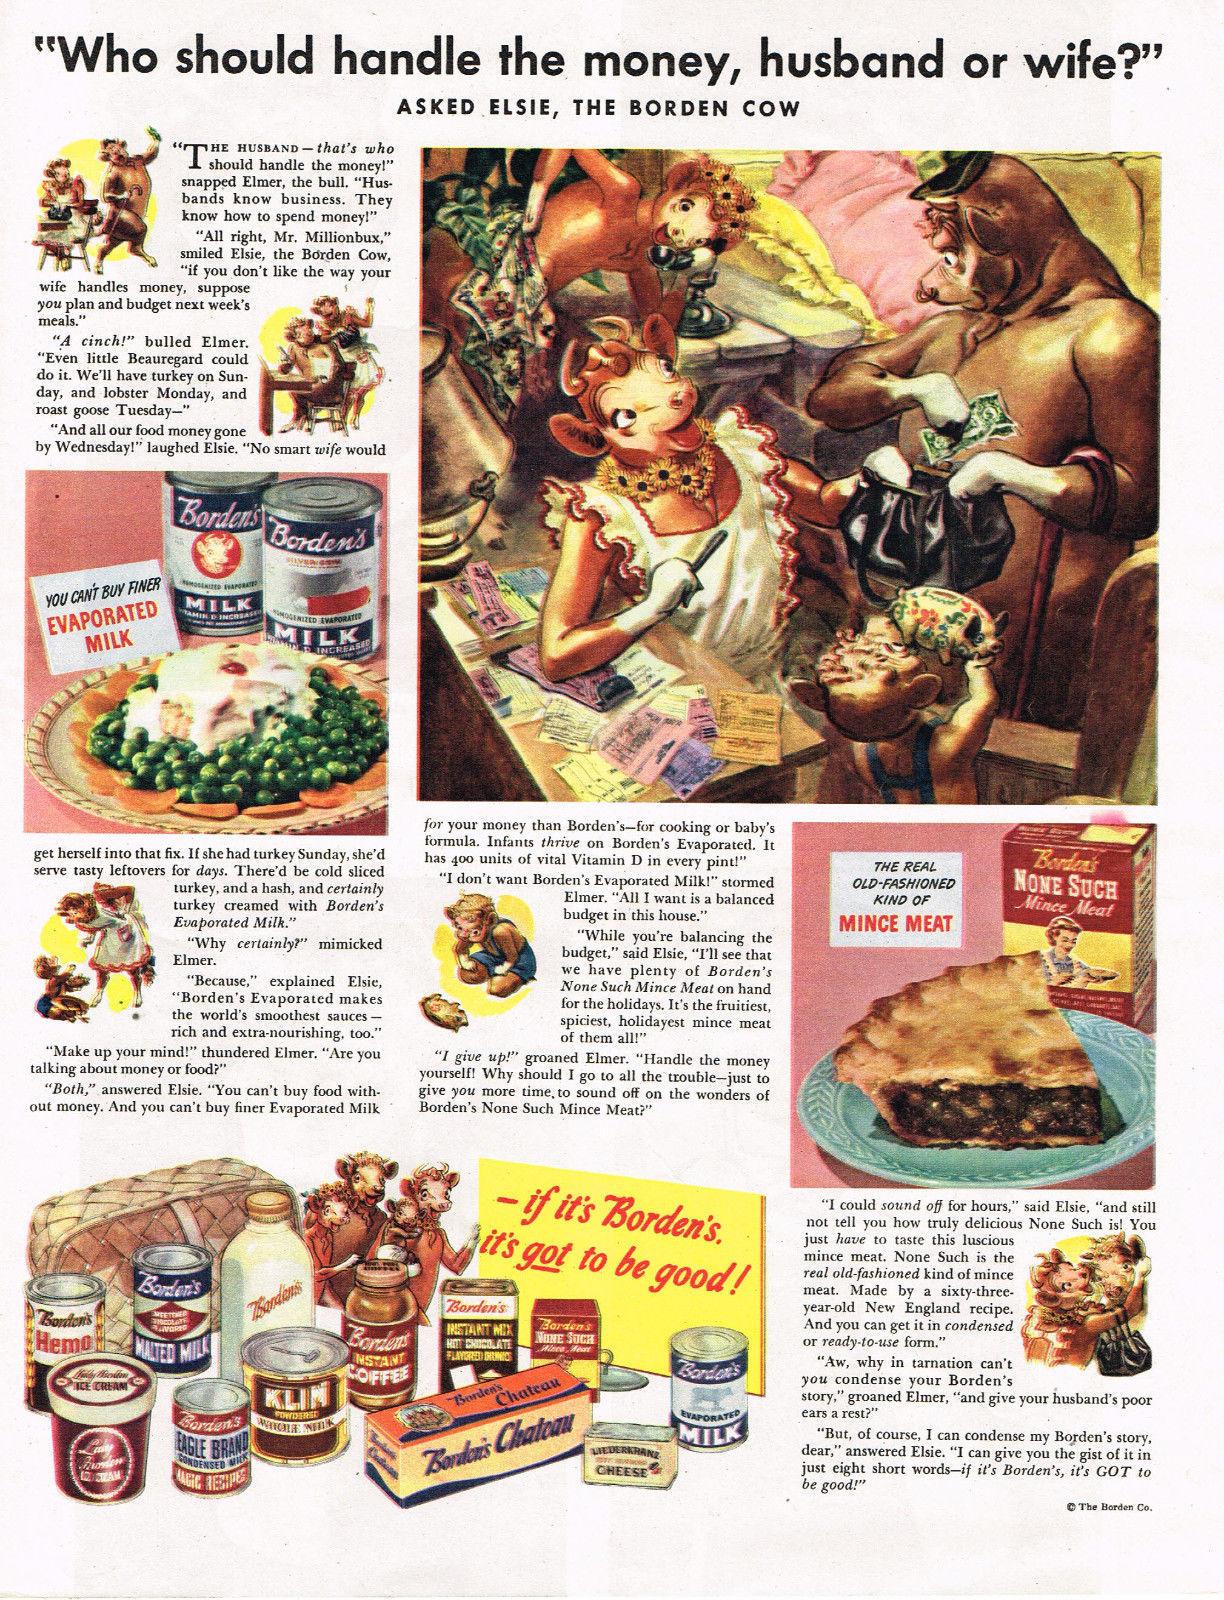 Vintage 1944 Magazine Ad Borden's Evaporated Milk & None Such Mince Meat - $5.93